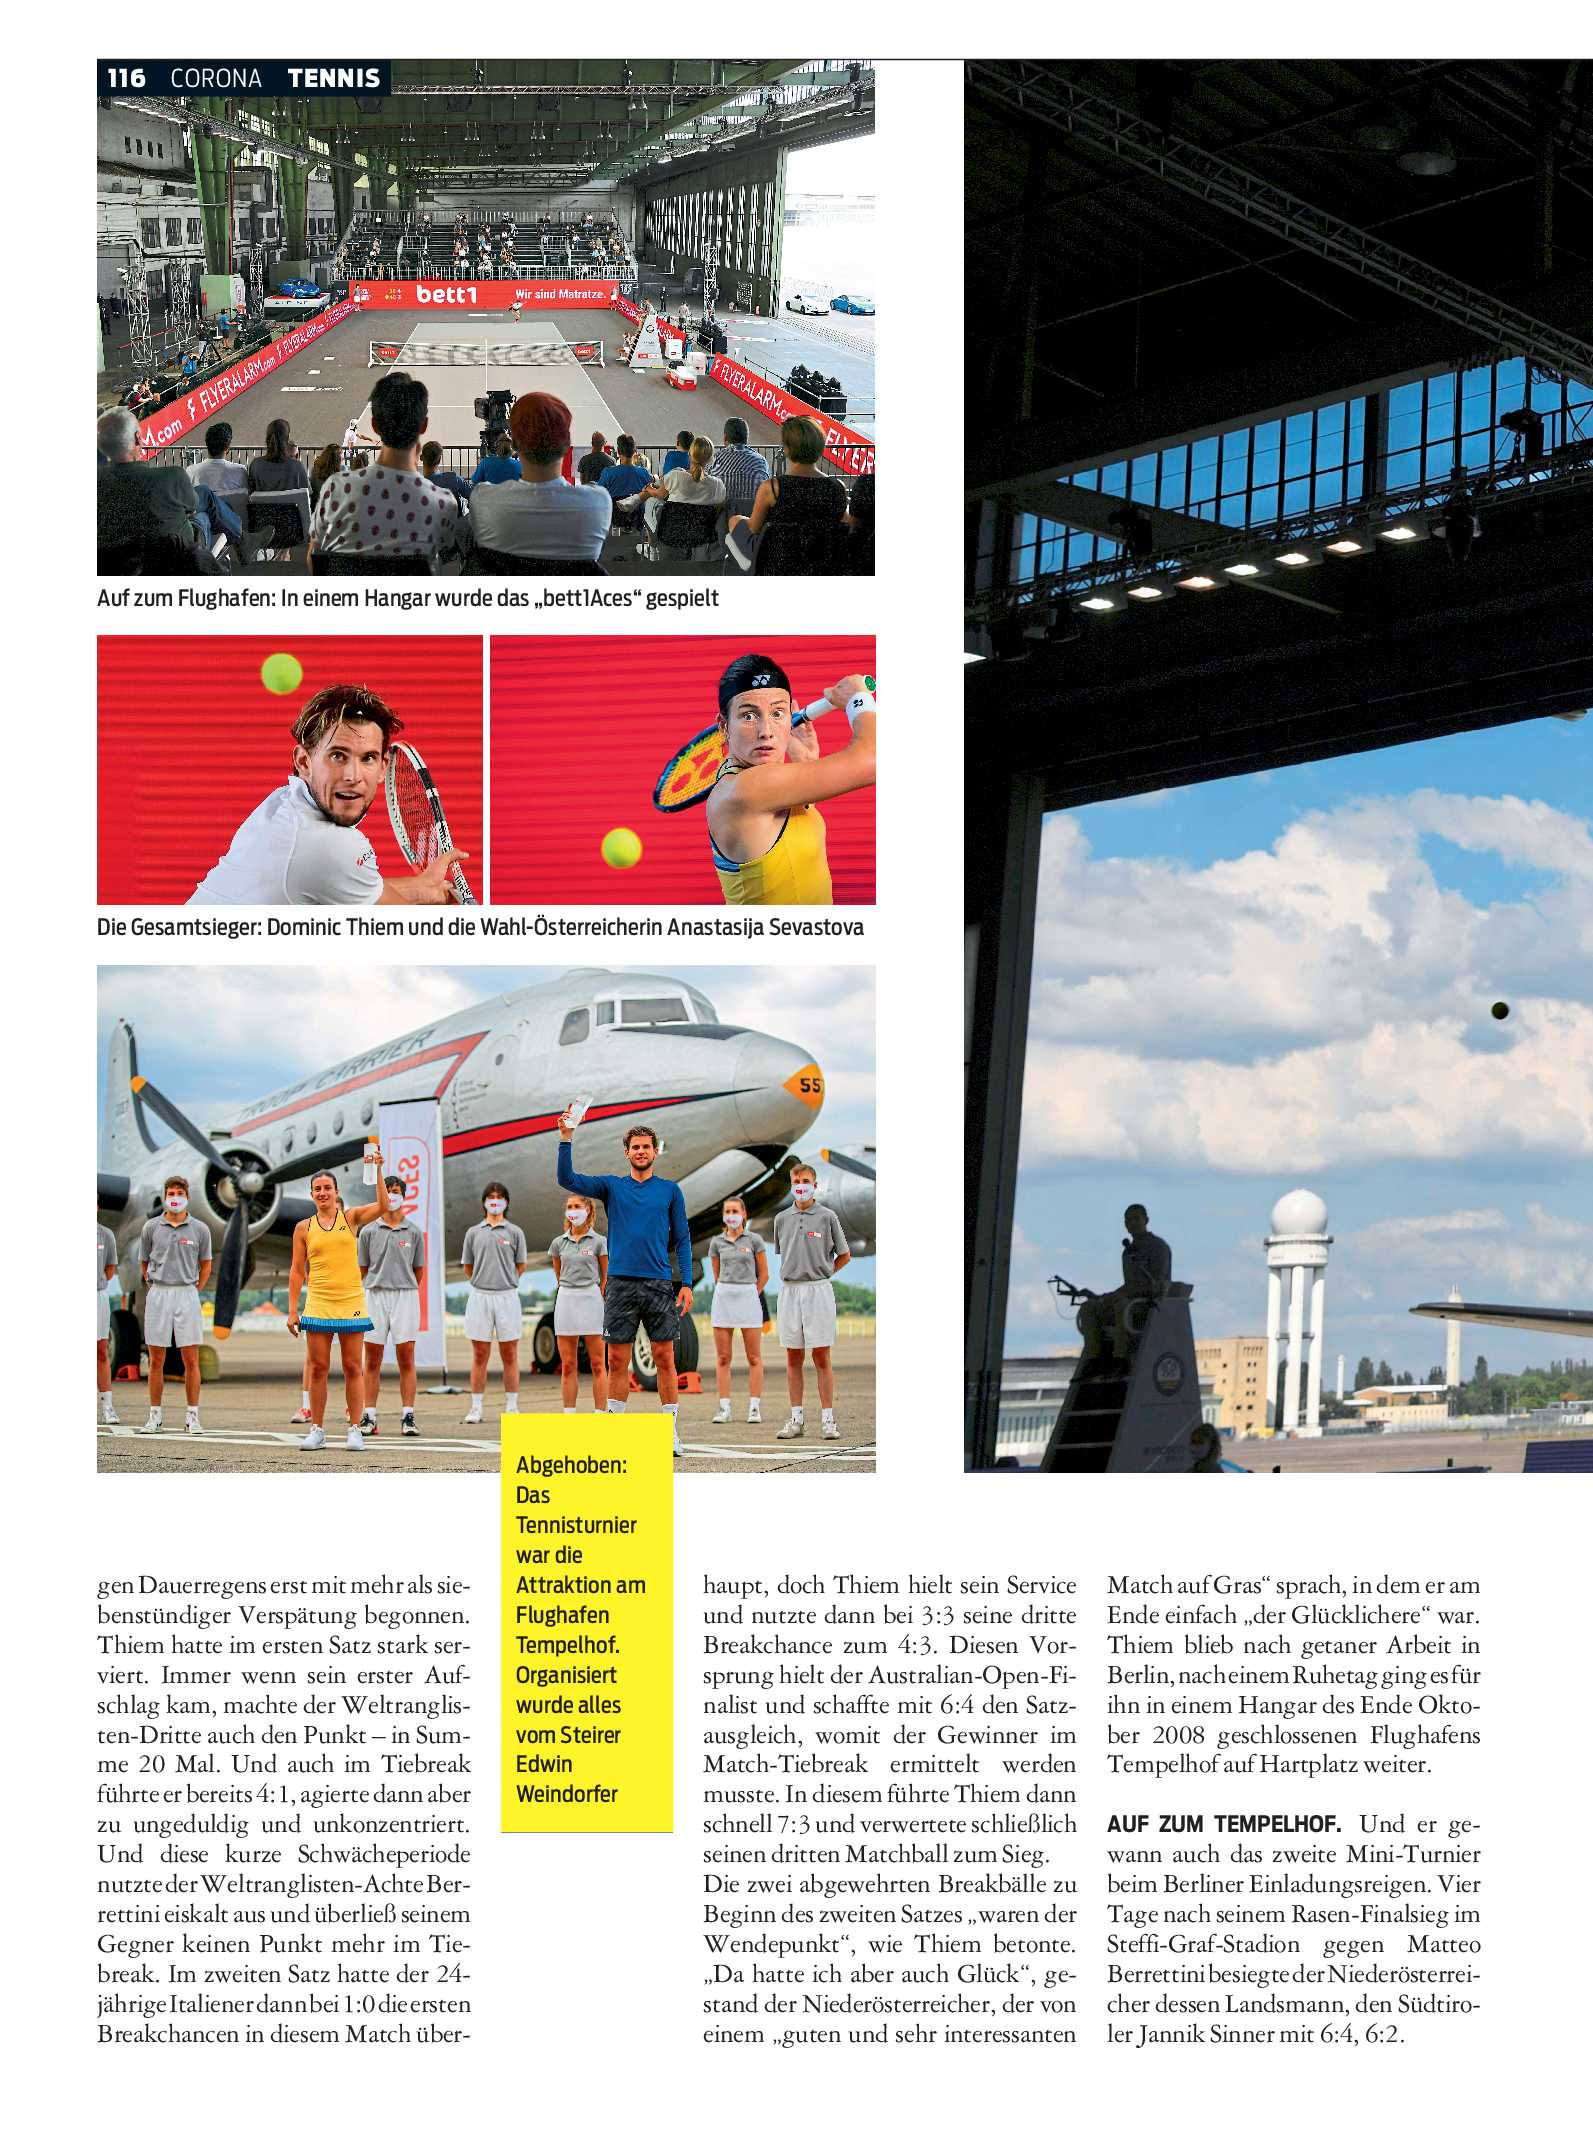 public/epaper/imported/20201209/kurier/magazin/magazin_20201209_116.jpg